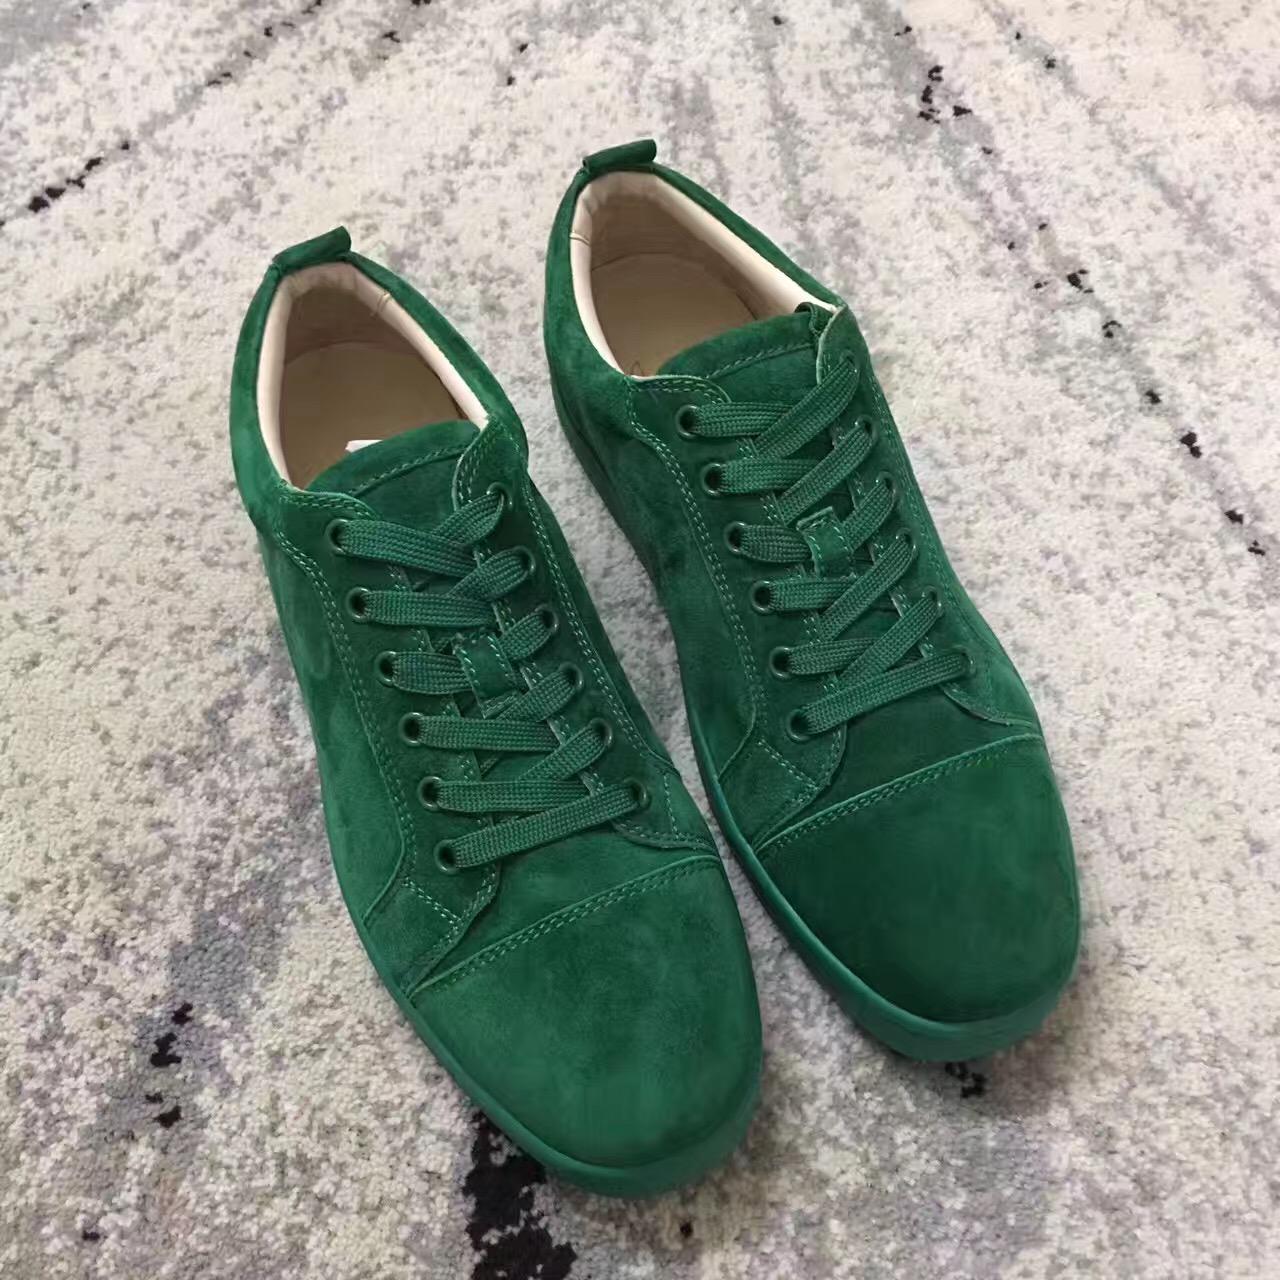 Top Junior Green Suede Shoes